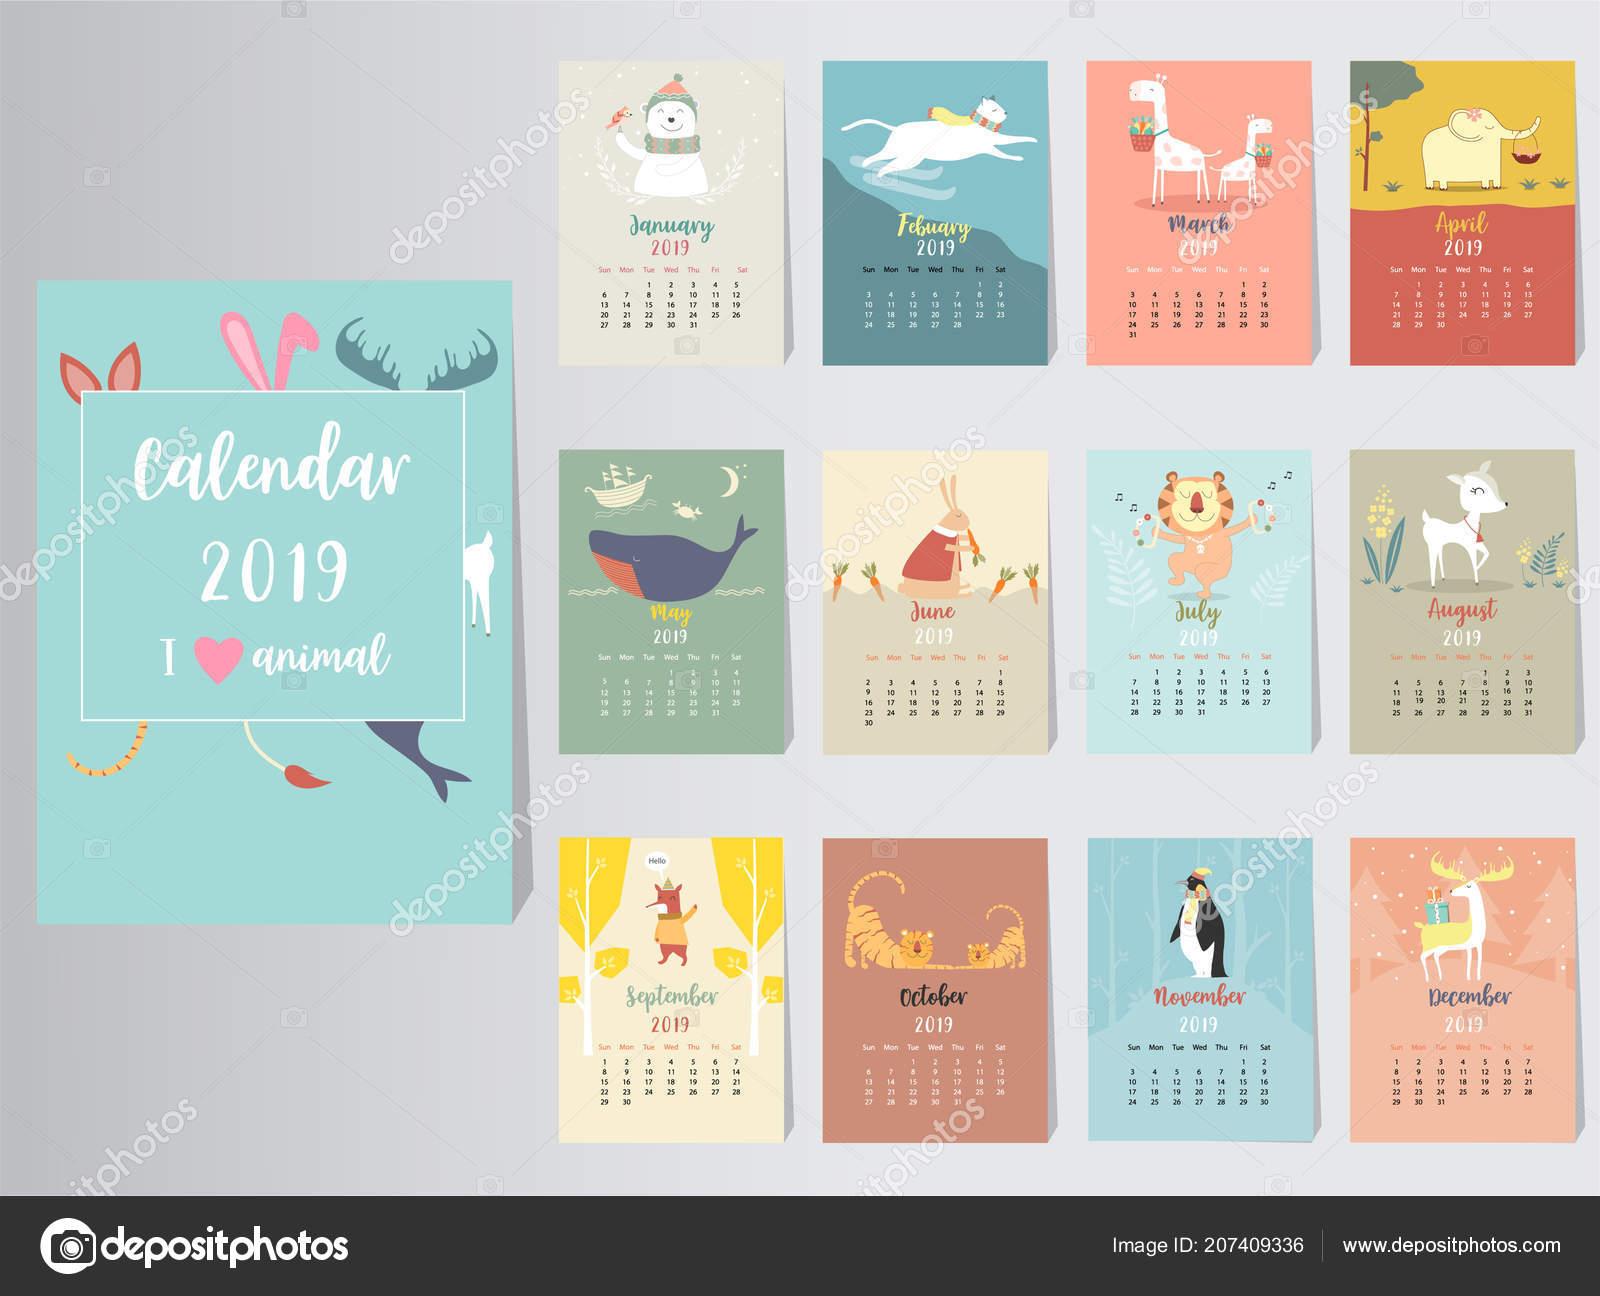 cute animal calendar 2019 design year pig monthly cards templates